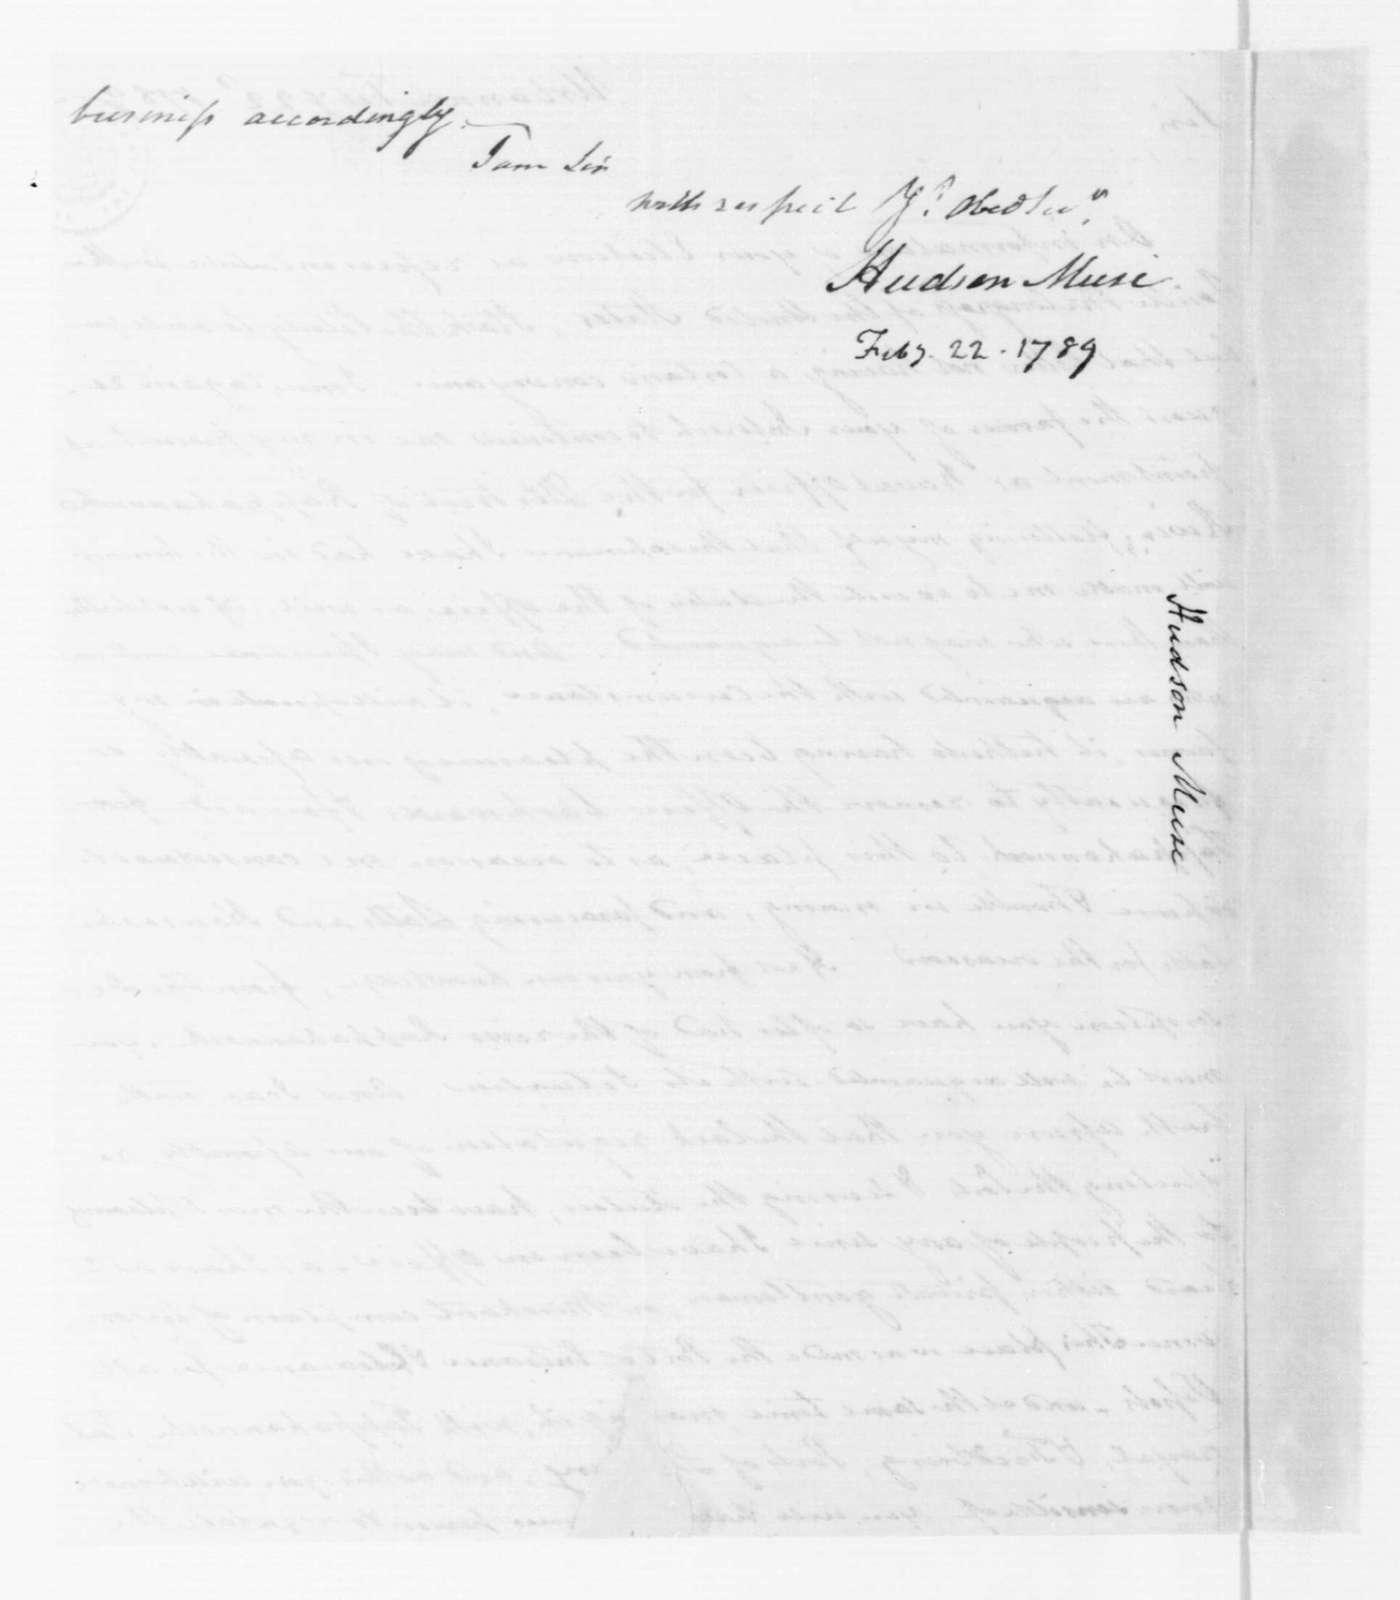 Hudson Muse to James Madison, February 22, 1789.